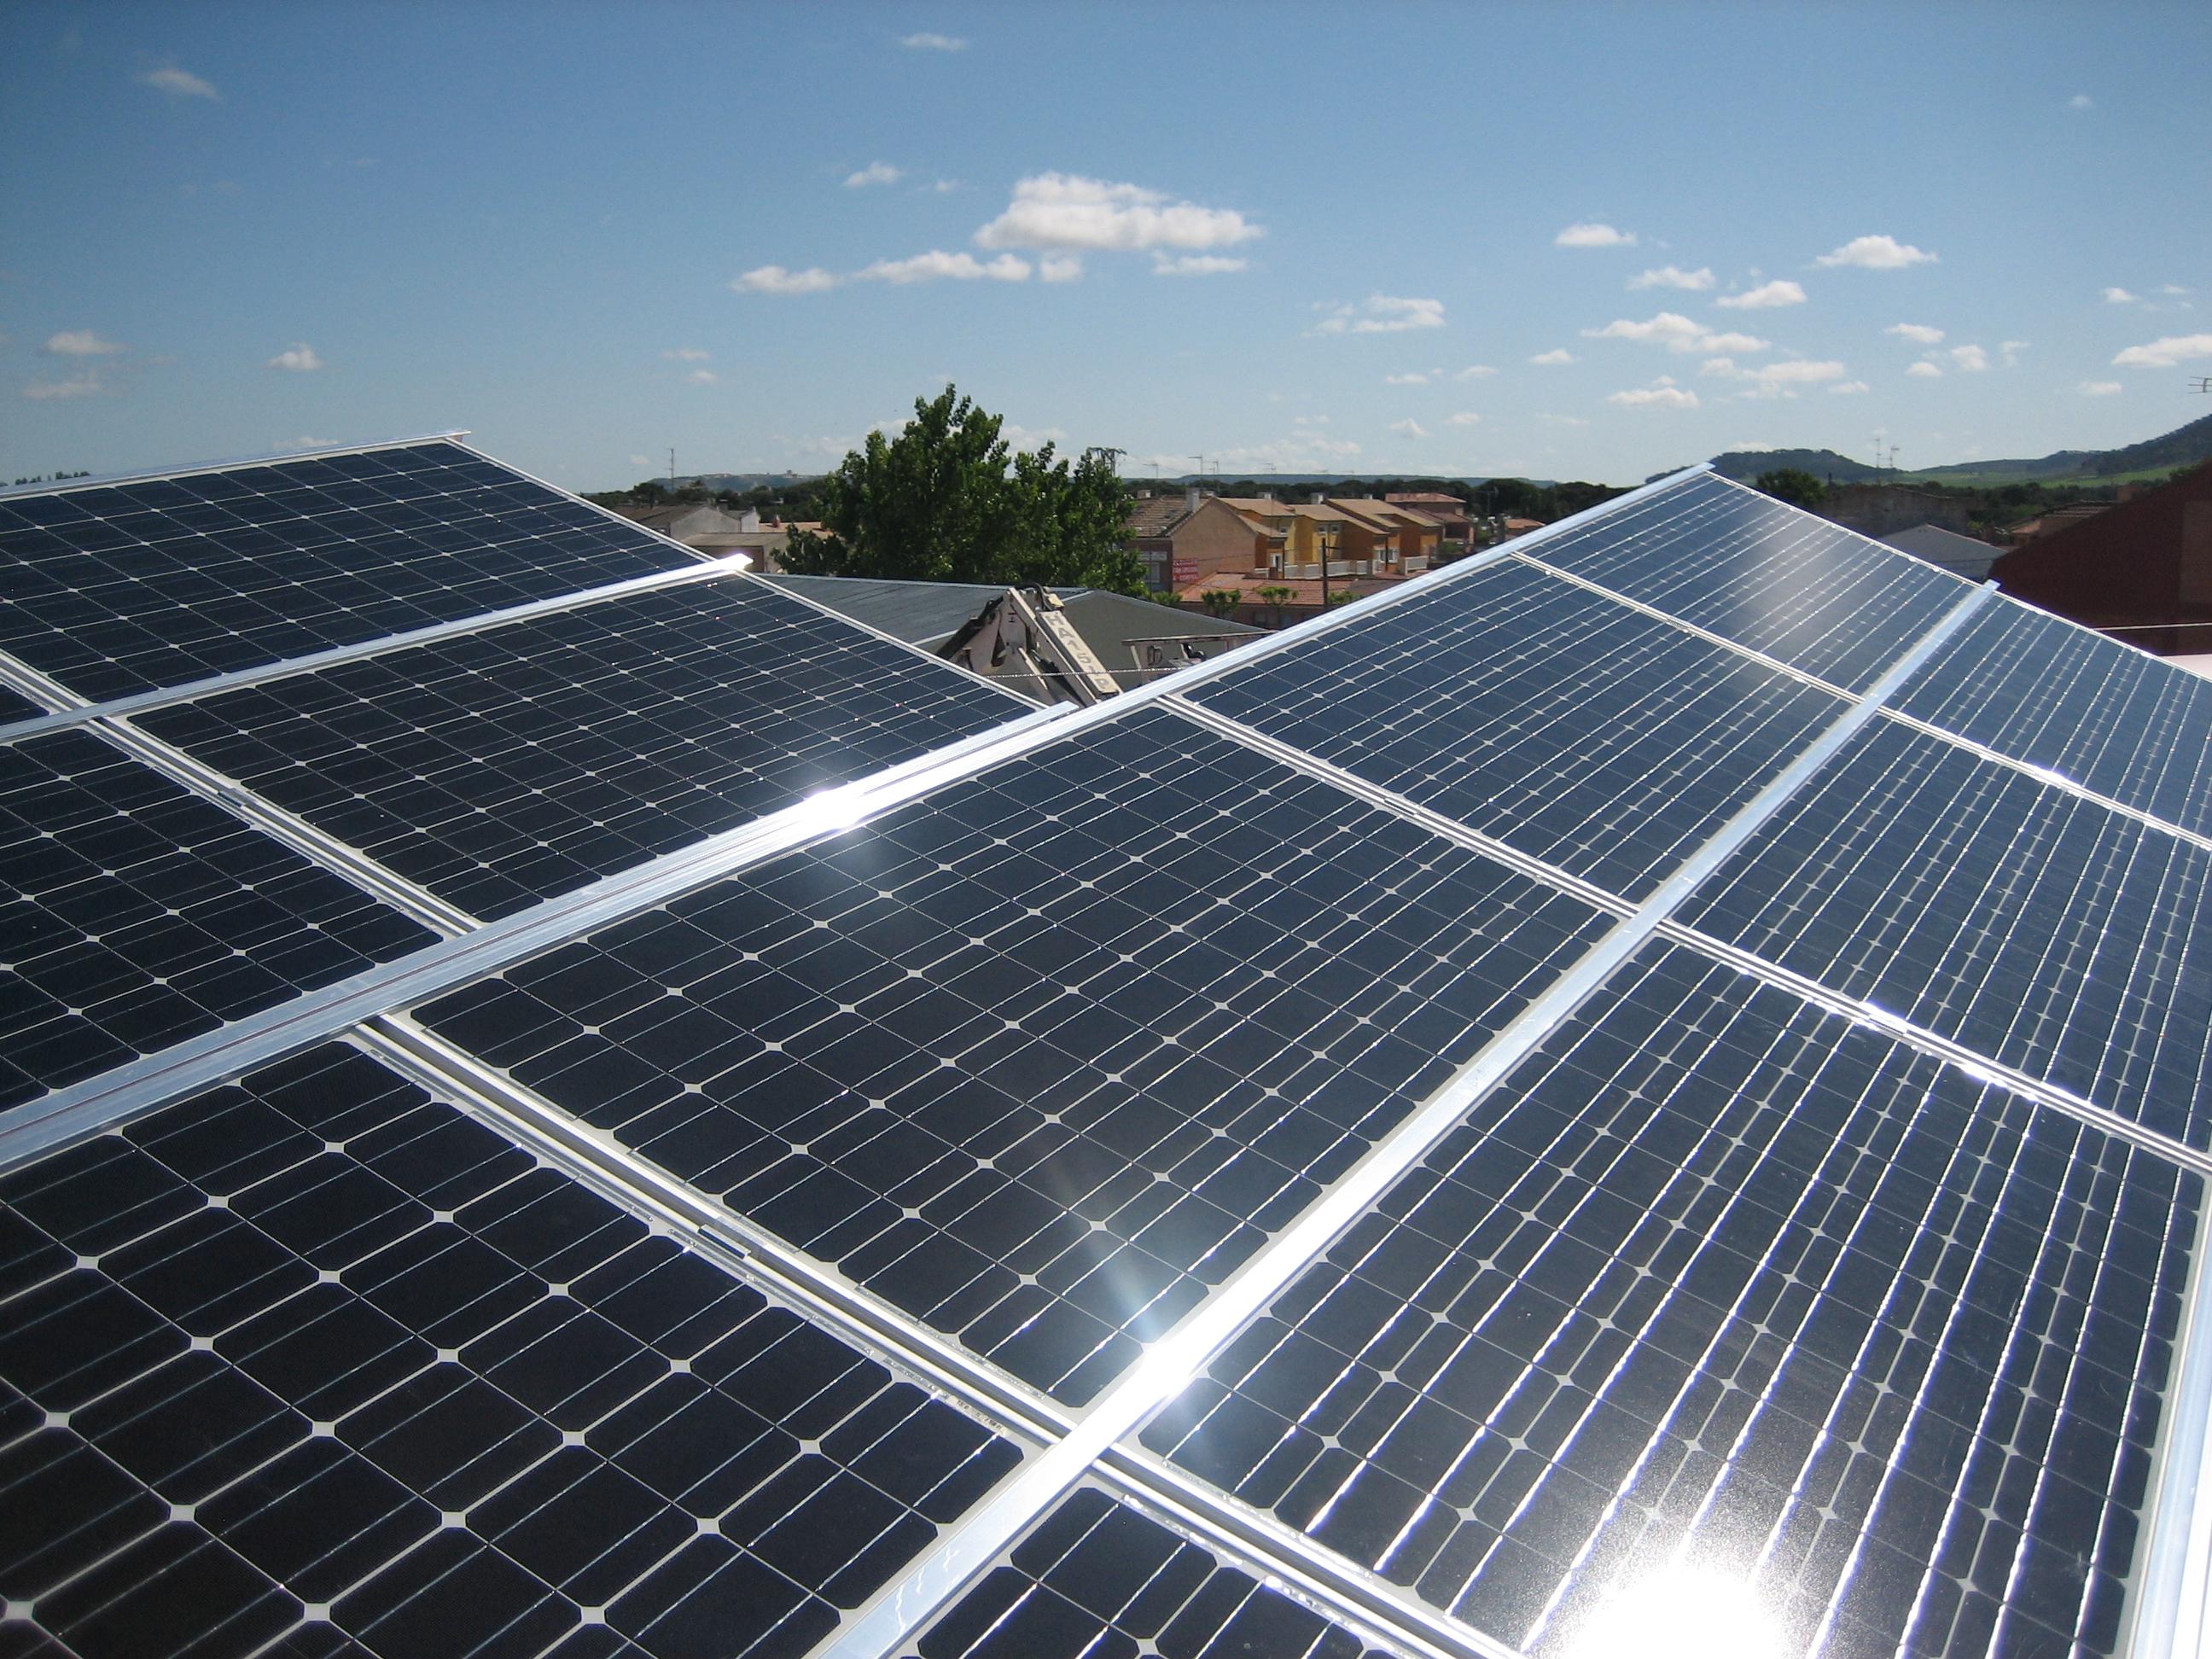 Greenpeace pide a los políticos que el mix energético se componga al 100% de energías renovables